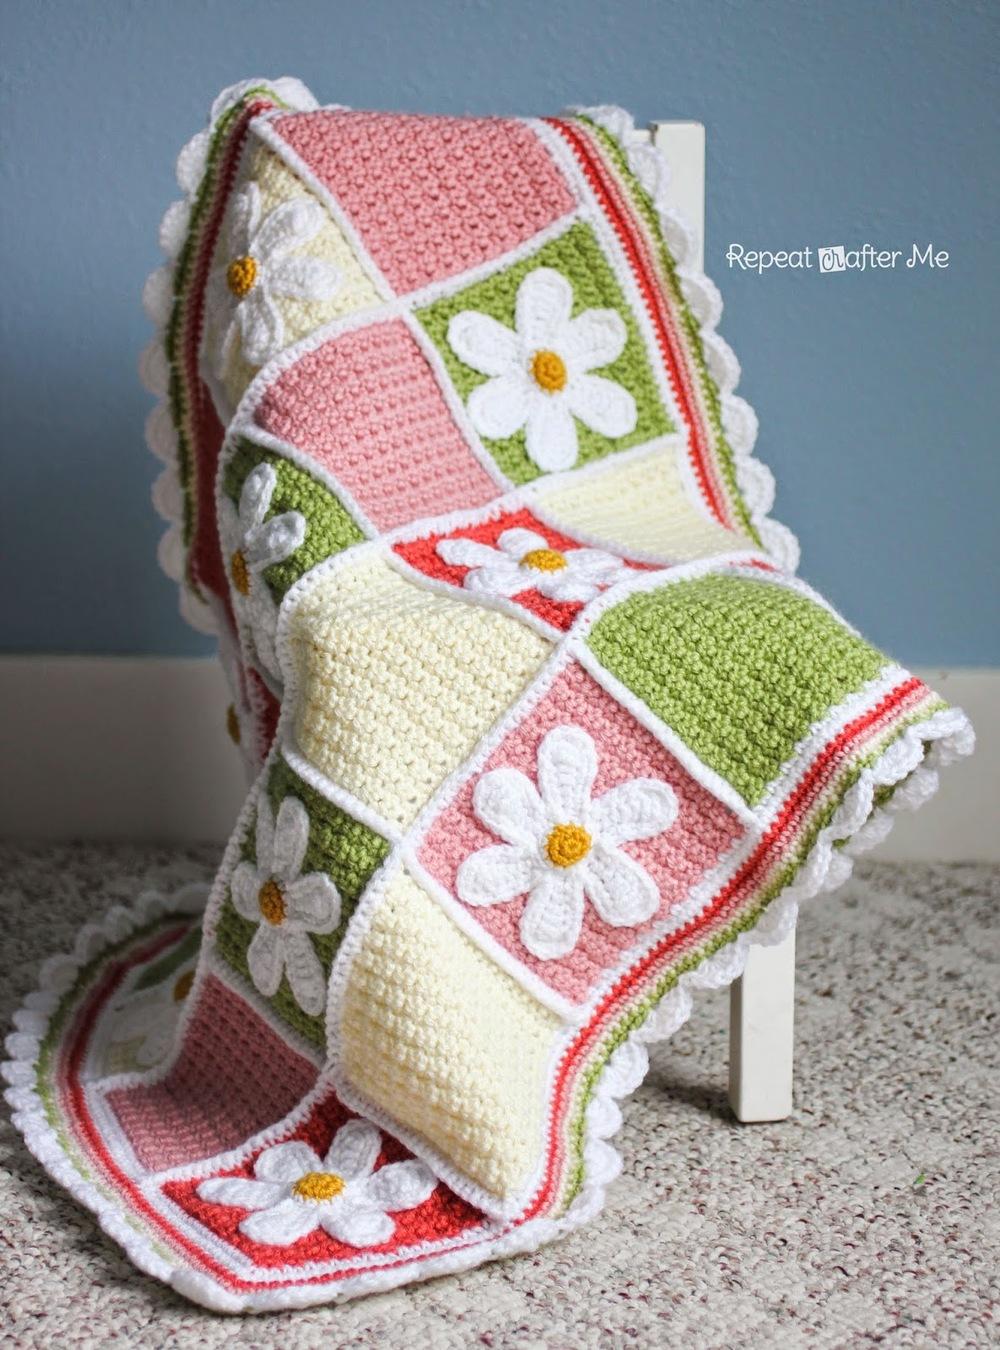 Darling Daisy Crochet Baby Blanket ...